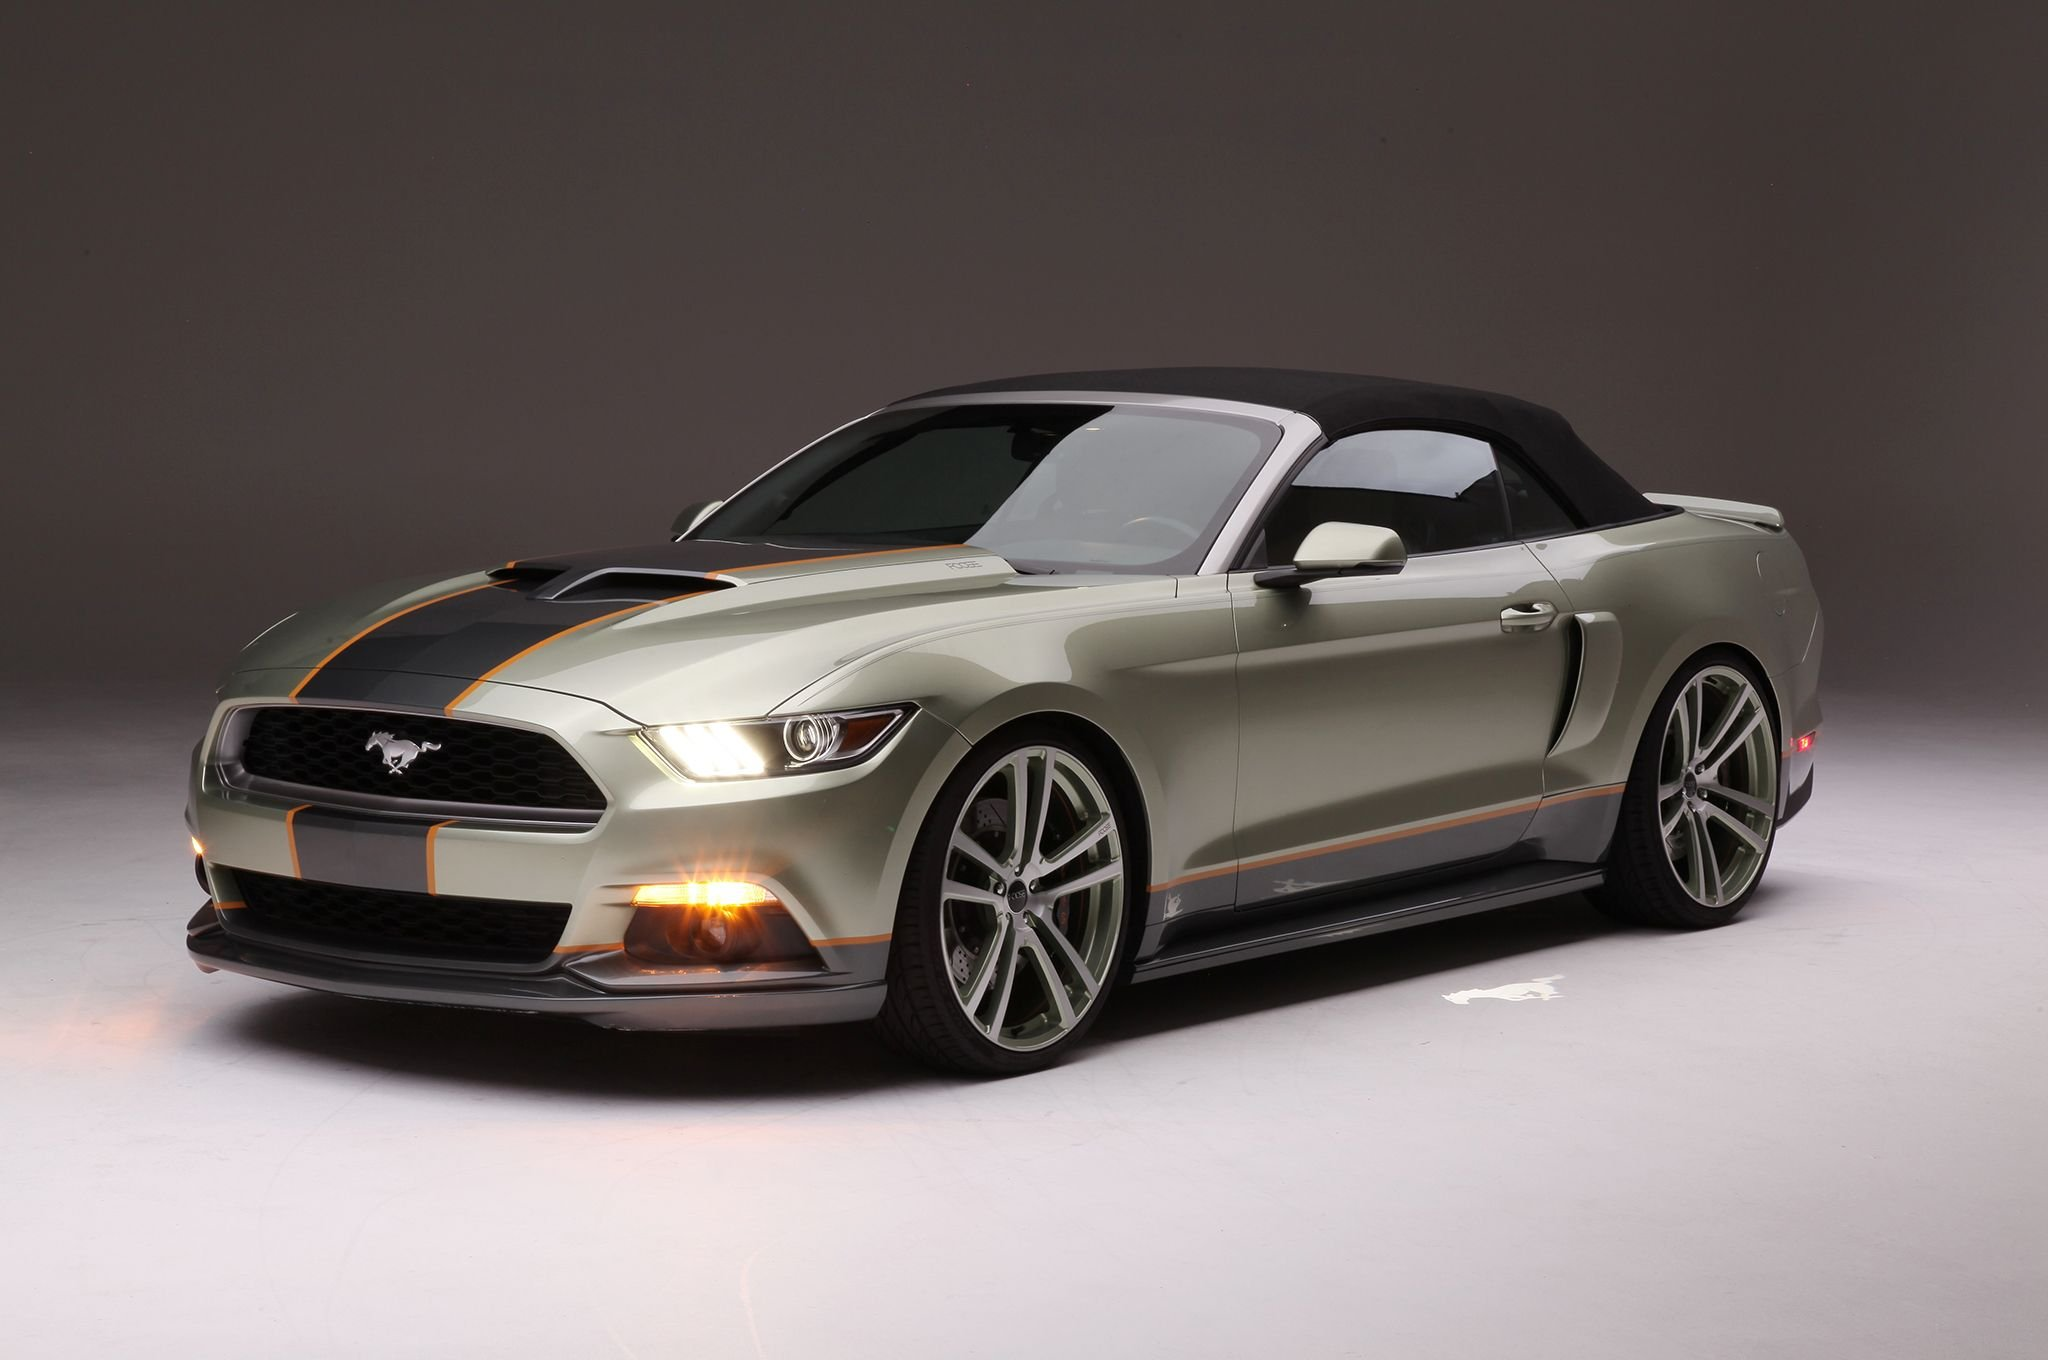 2015 Mustang Gt Side Stripes